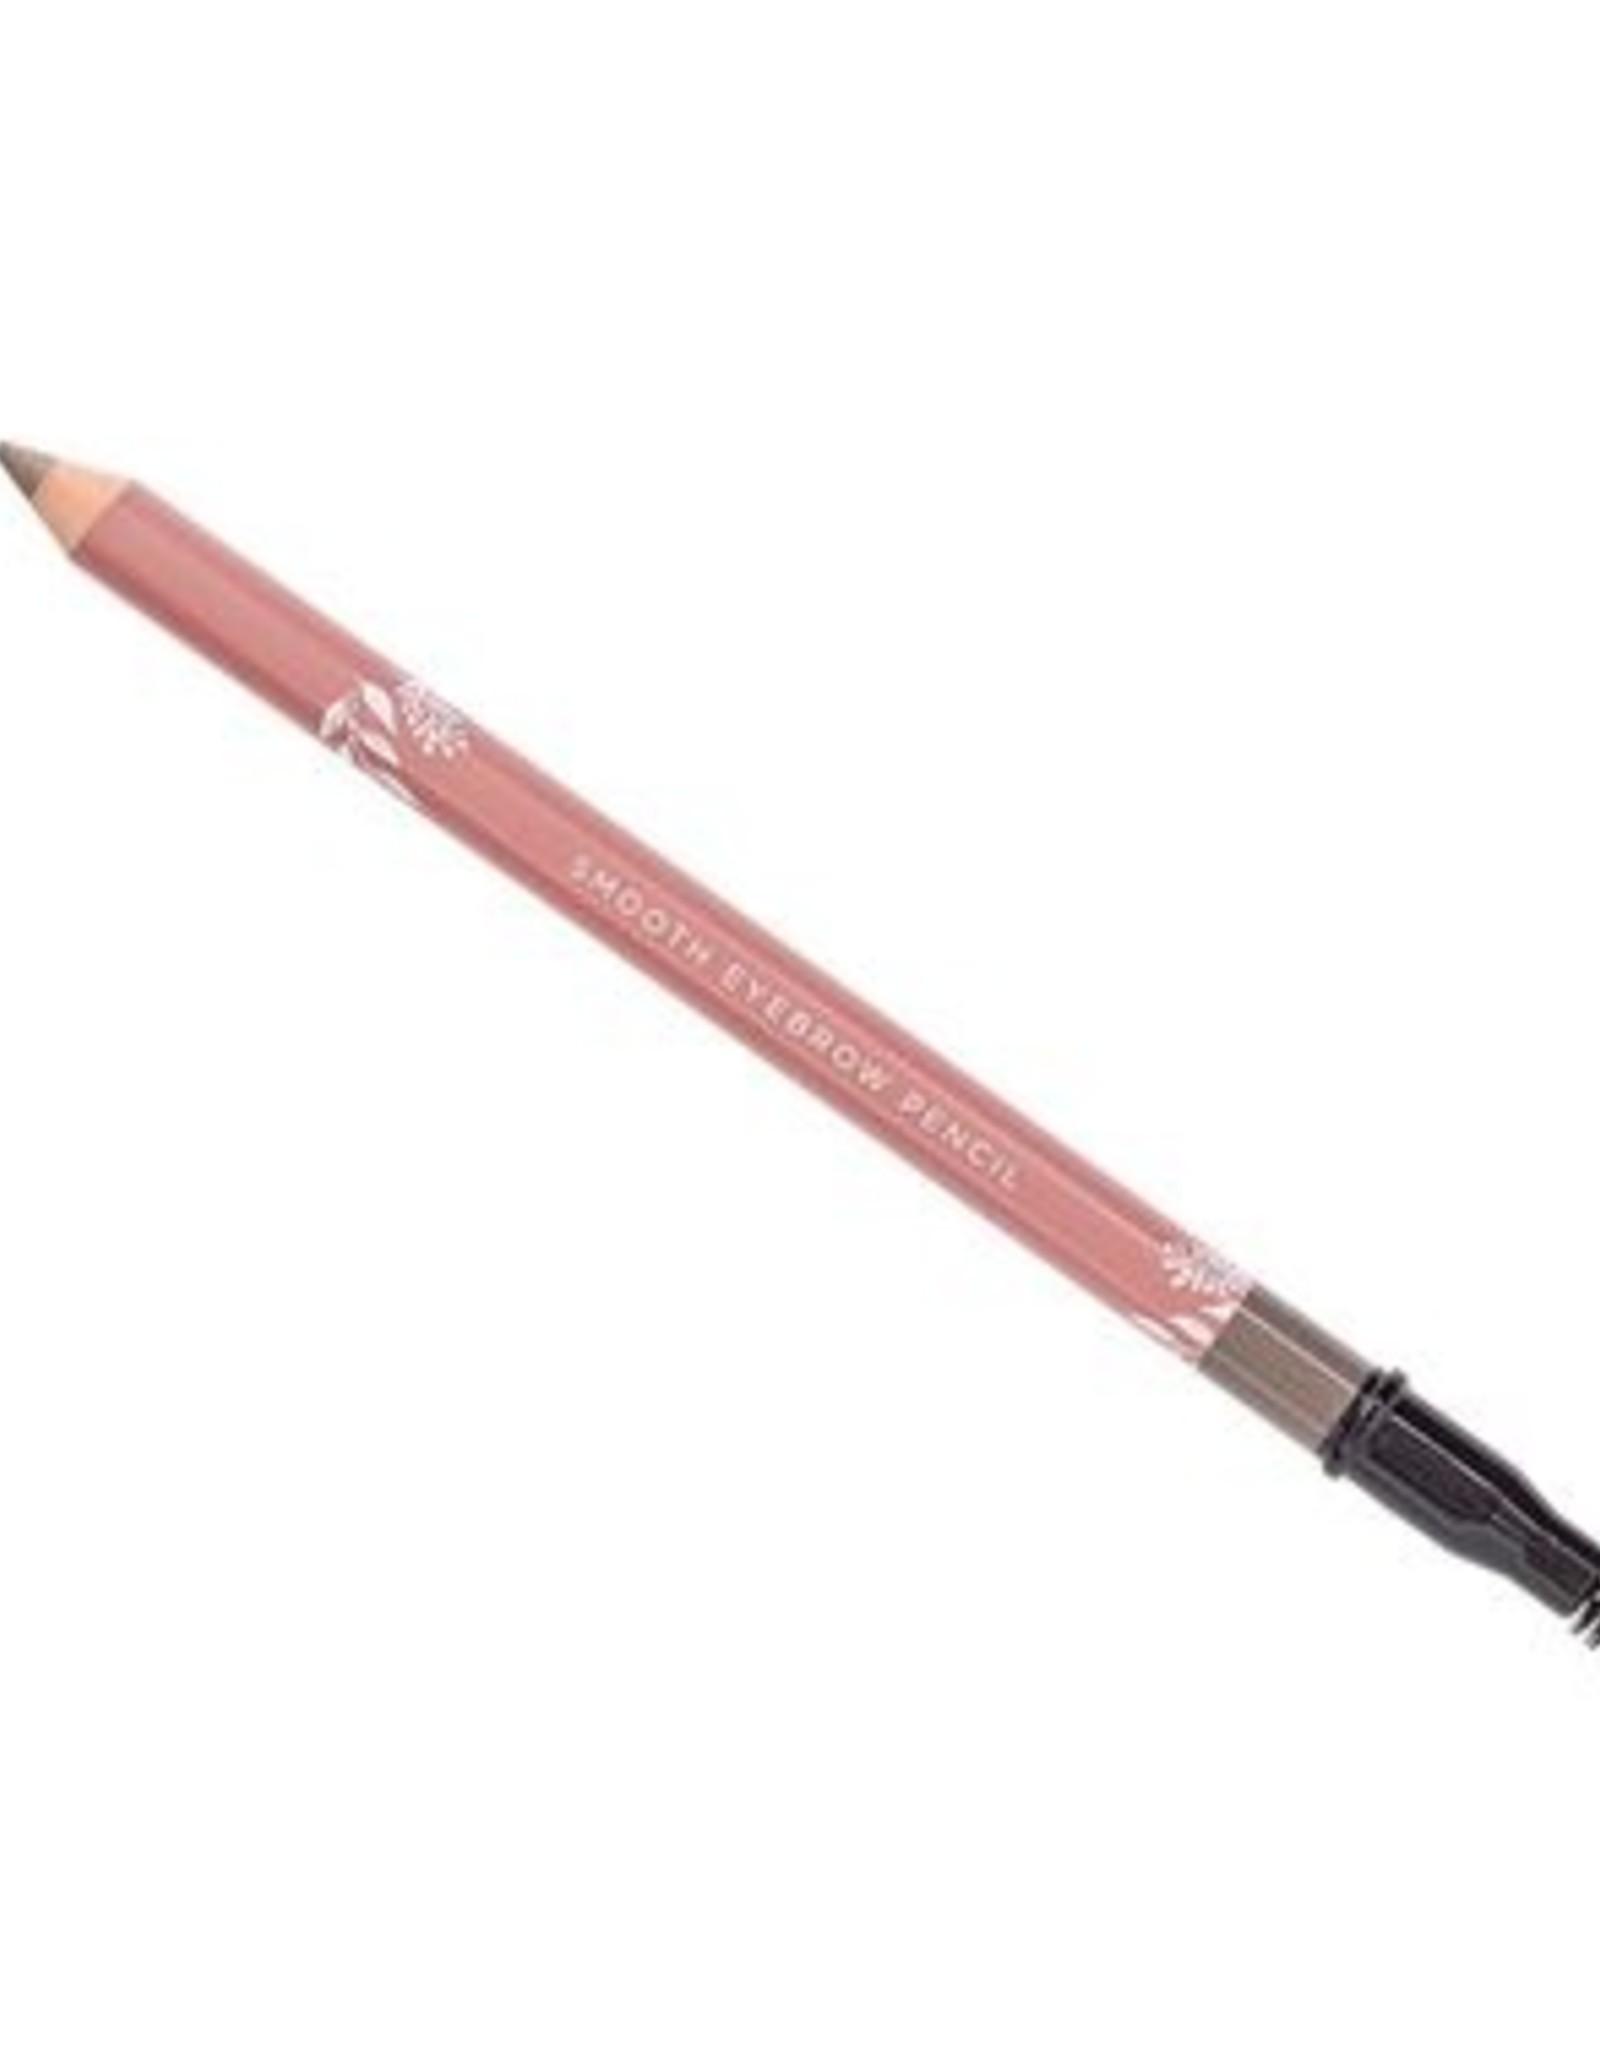 CentpurCent CentpurCent - Smooth Eyebrow Pencil Blonde